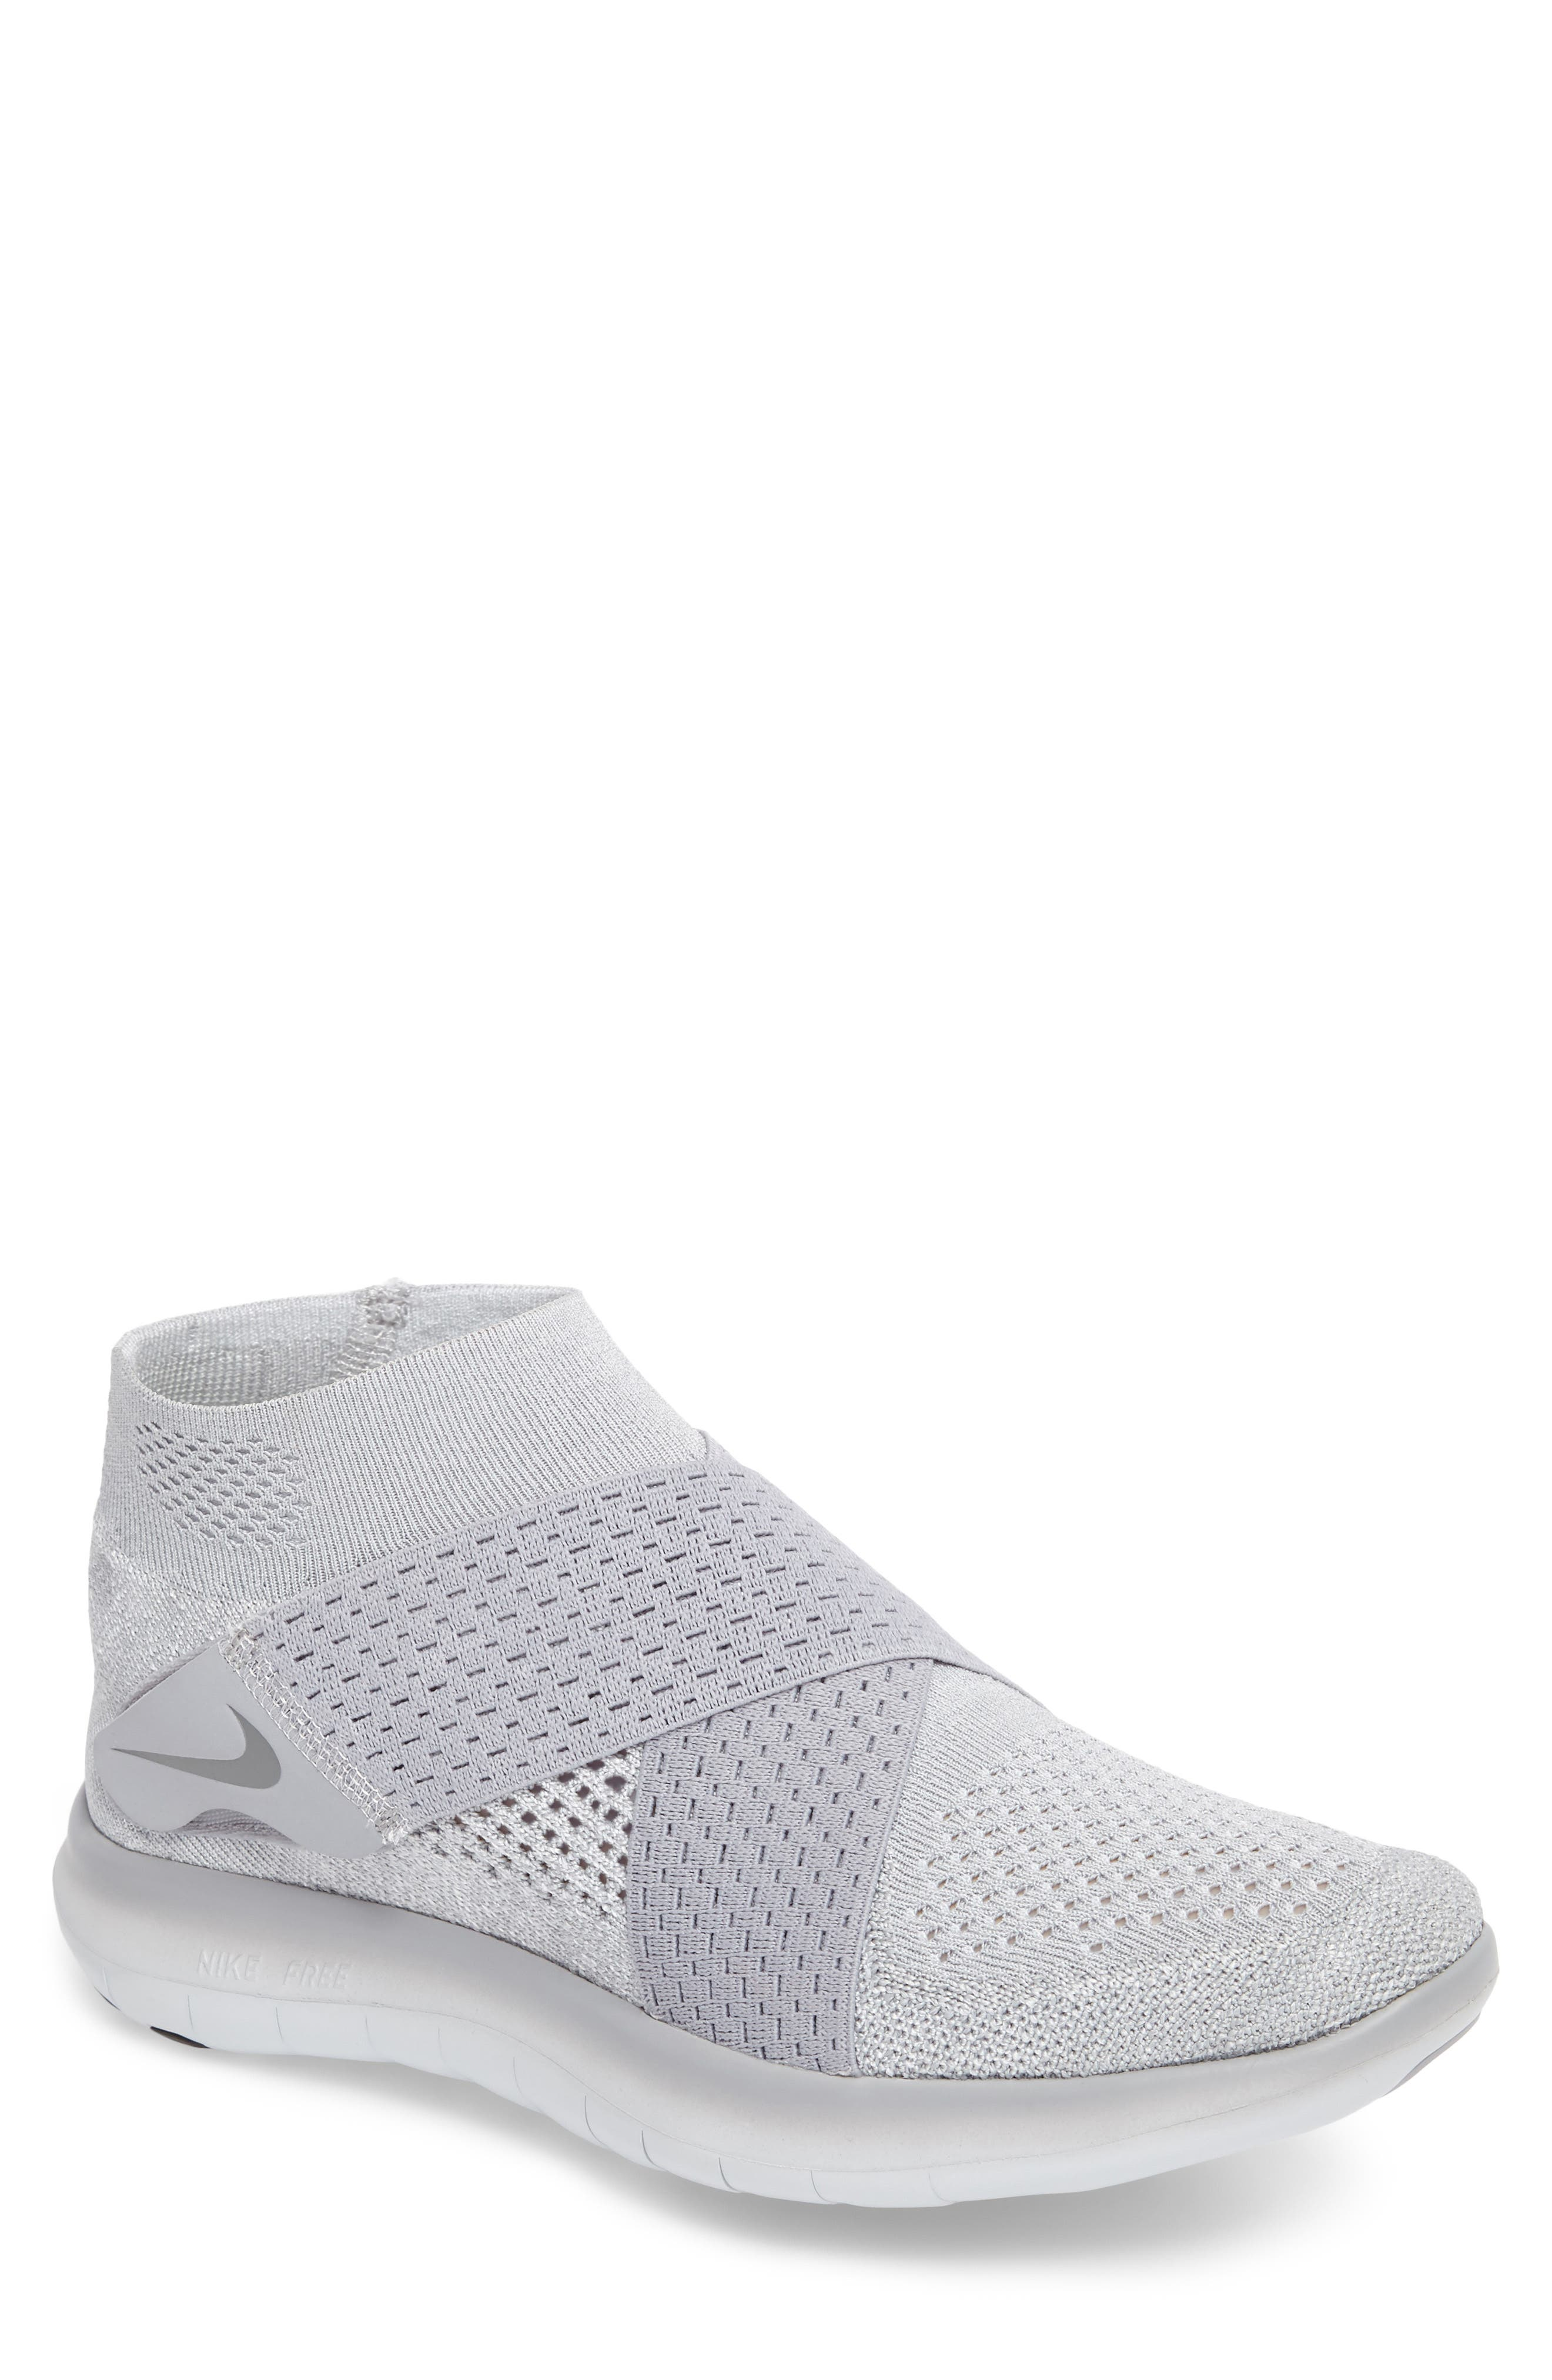 Nike Free RN Motion Flyknit 2 Running Shoe (Men)